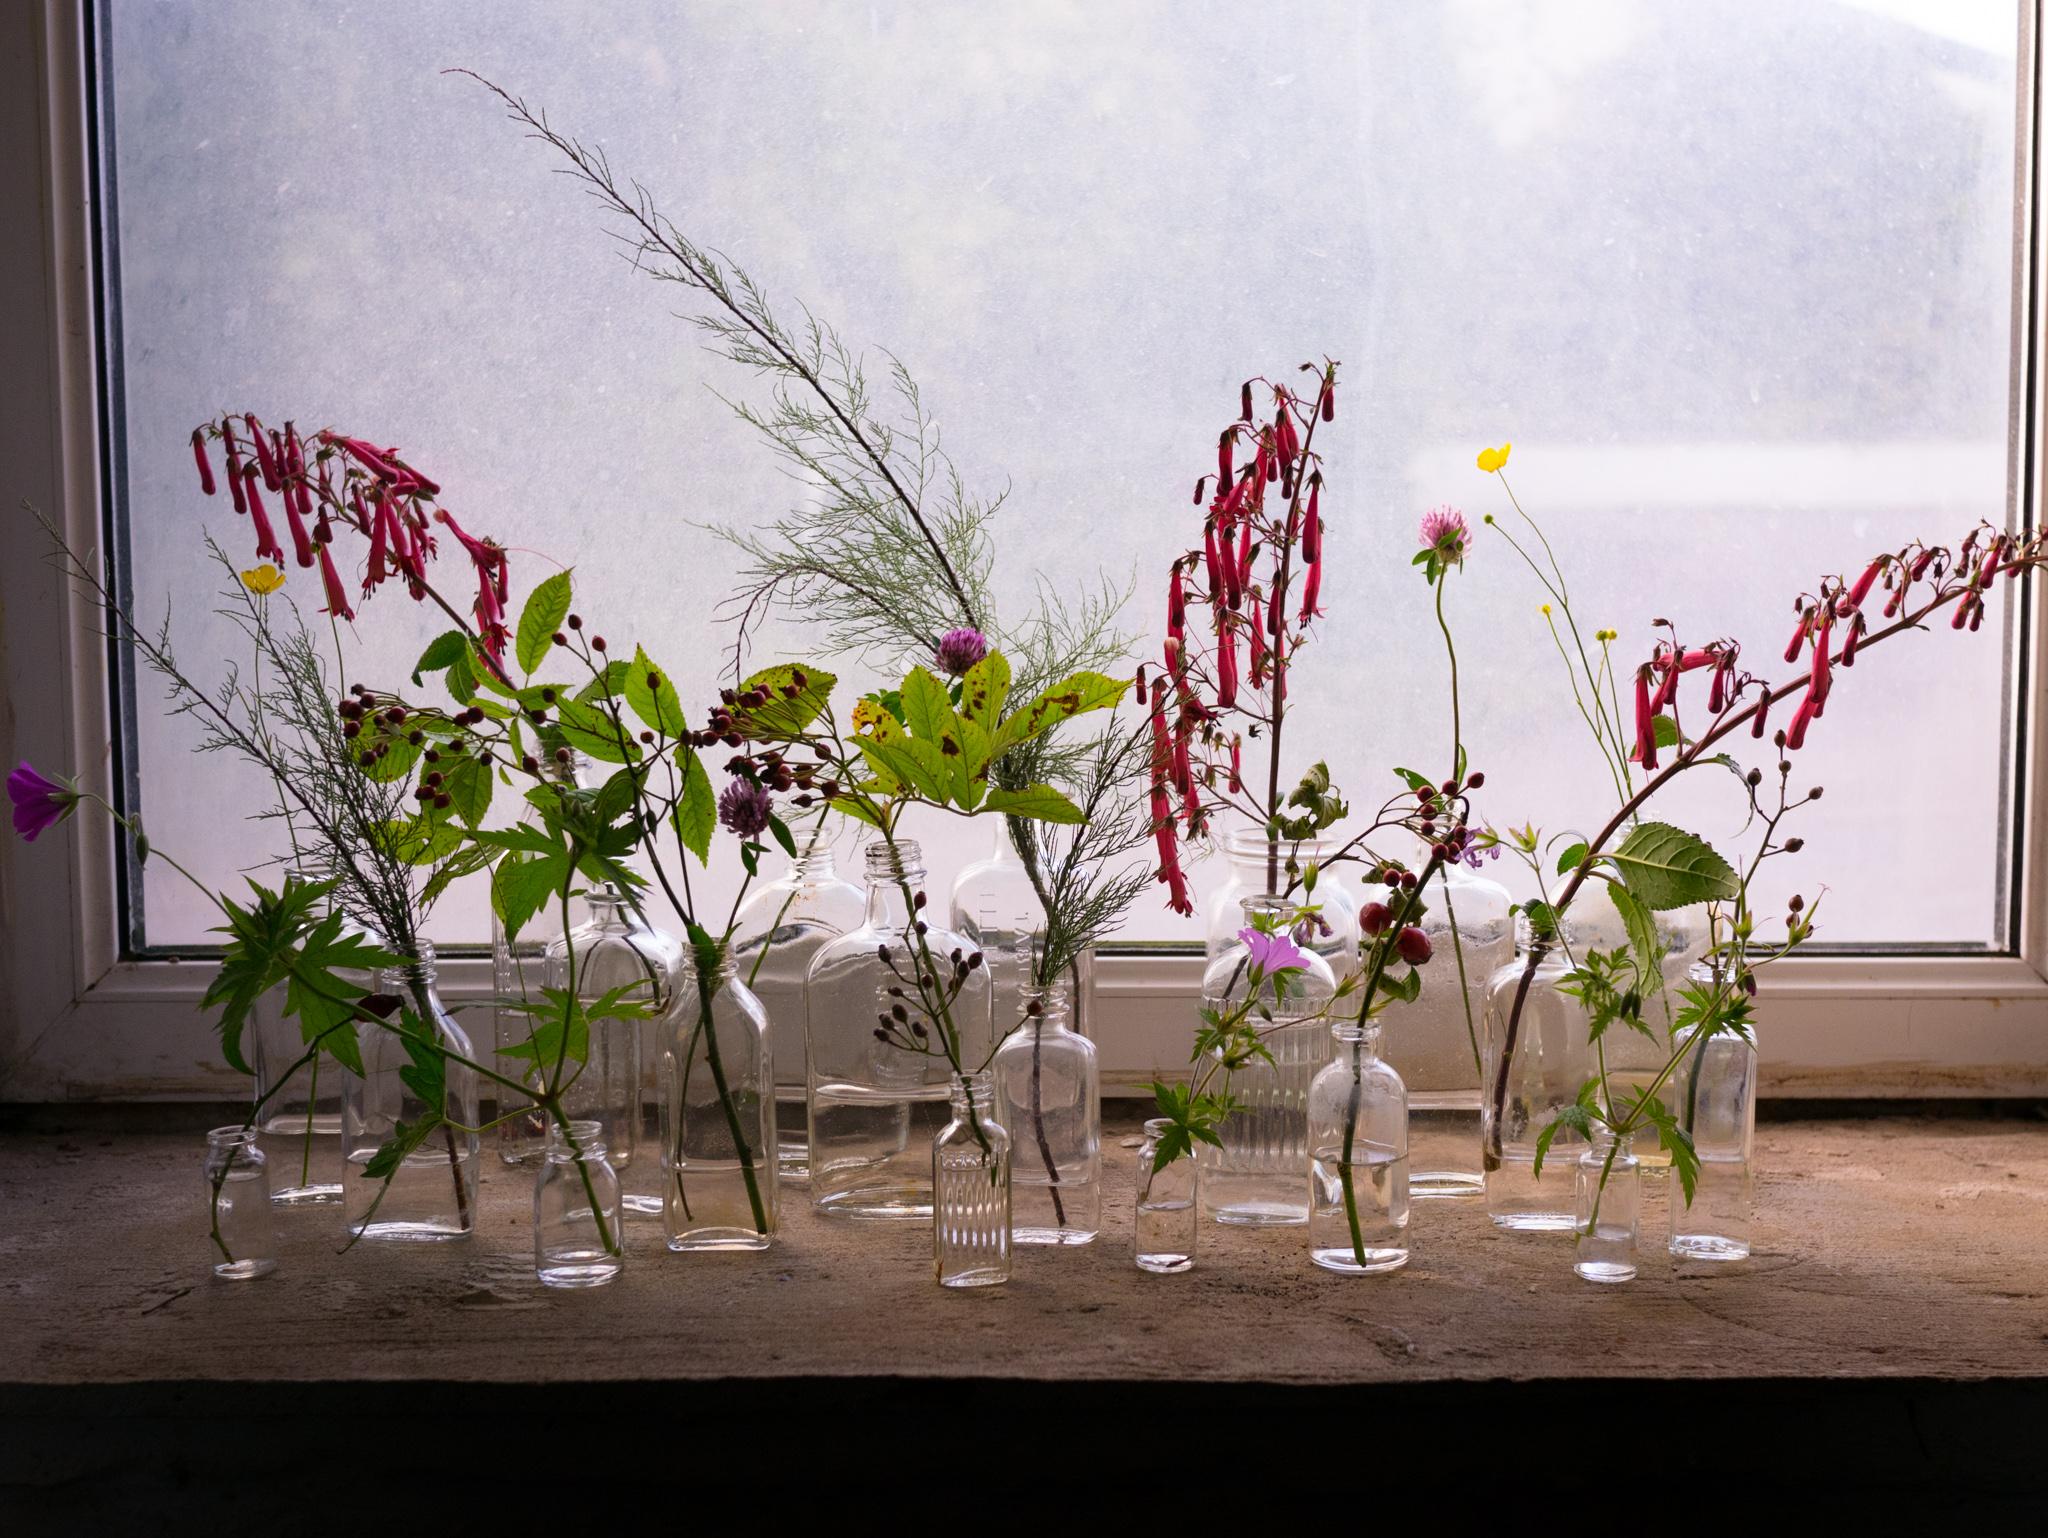 Making a floral display with vintage bottles